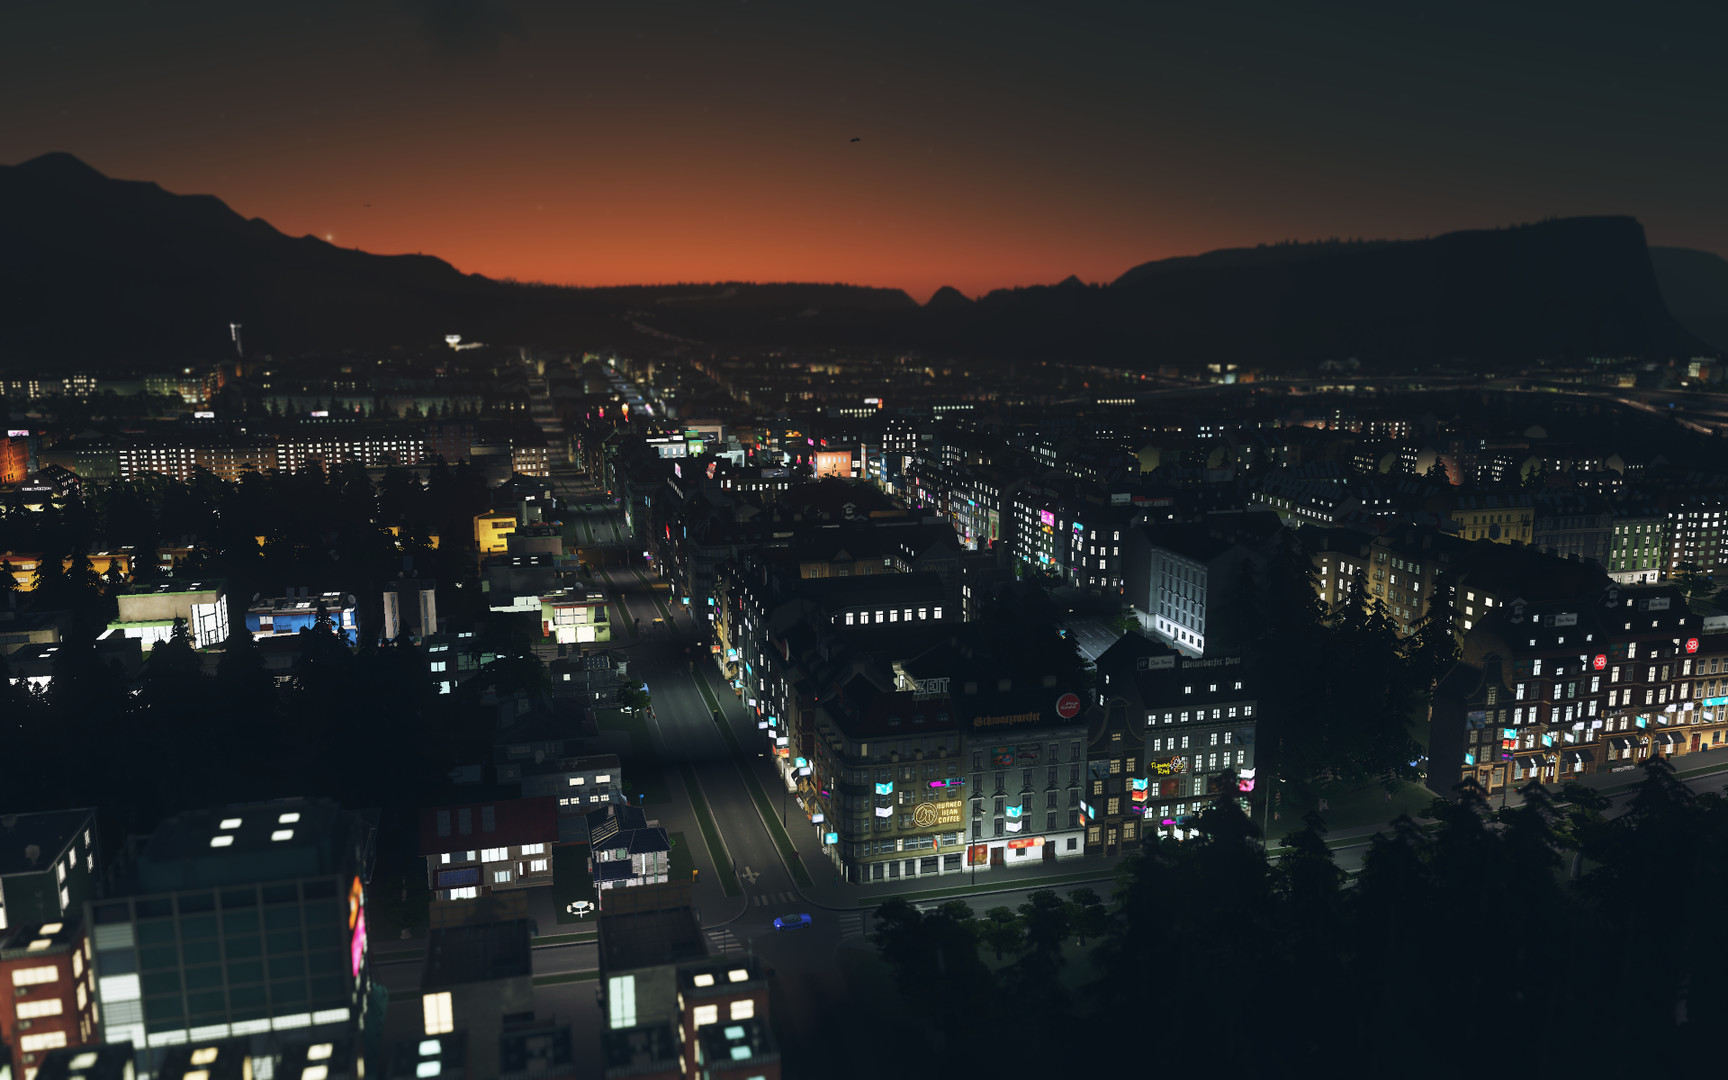 Cities Skylines: After Dark STEAM-key+GIFT (RU+CIS) 2019